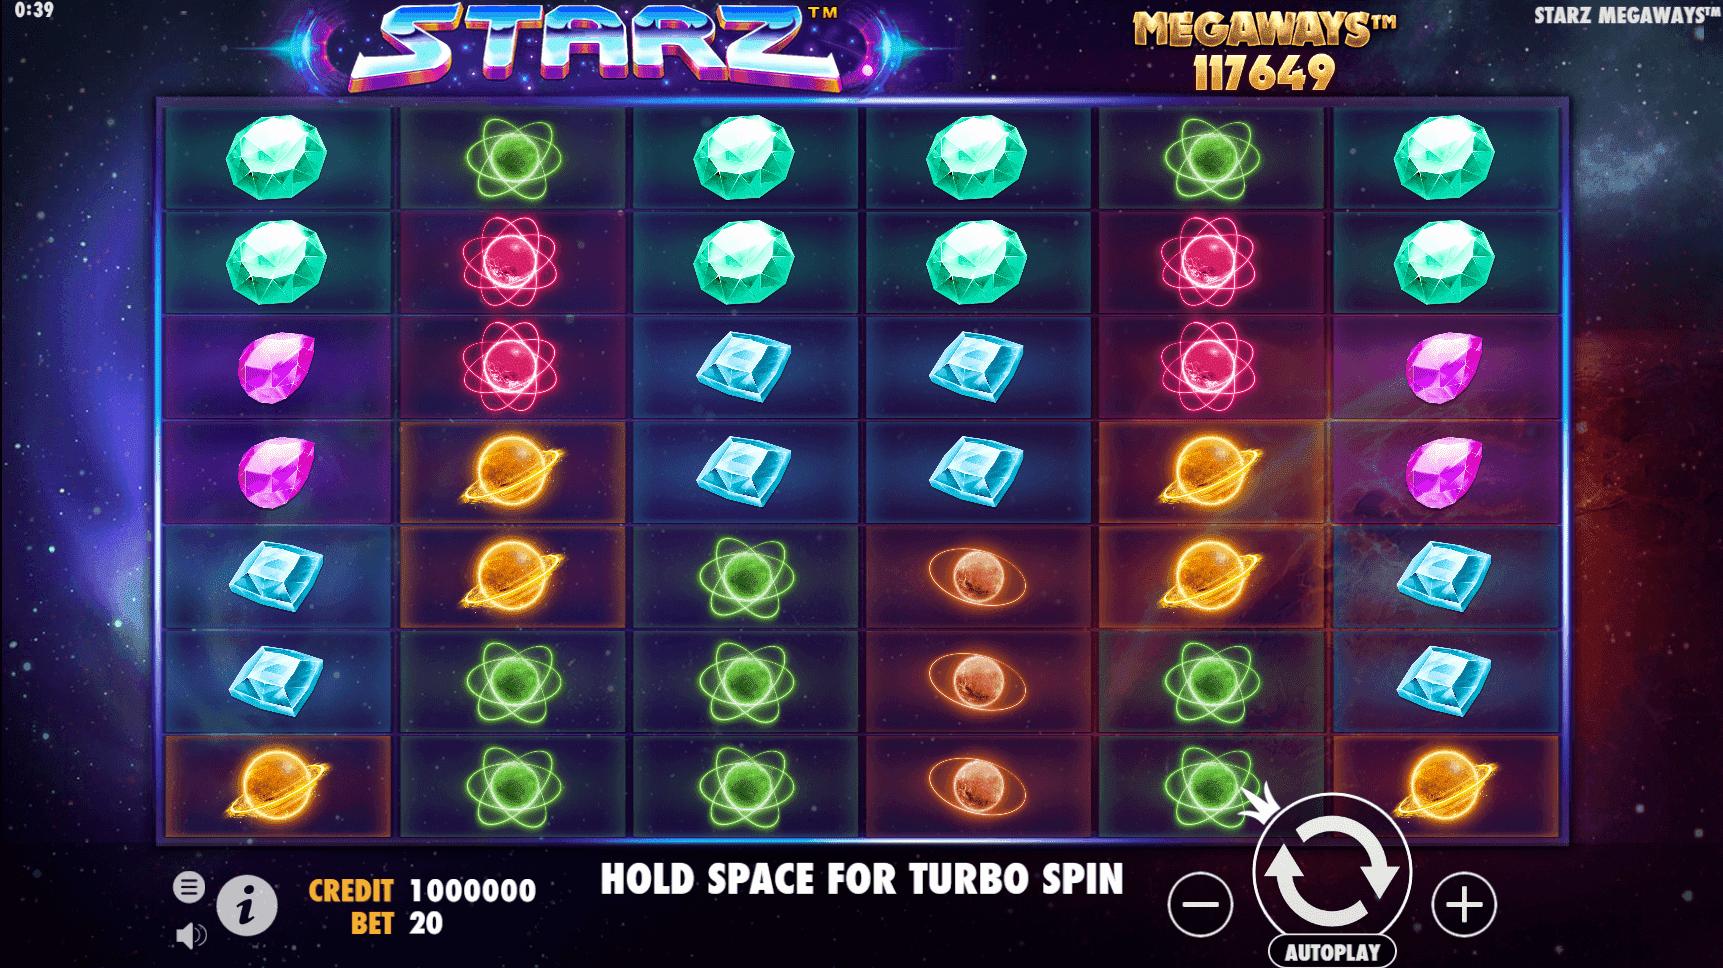 Starz Megaways slot machine screenshot